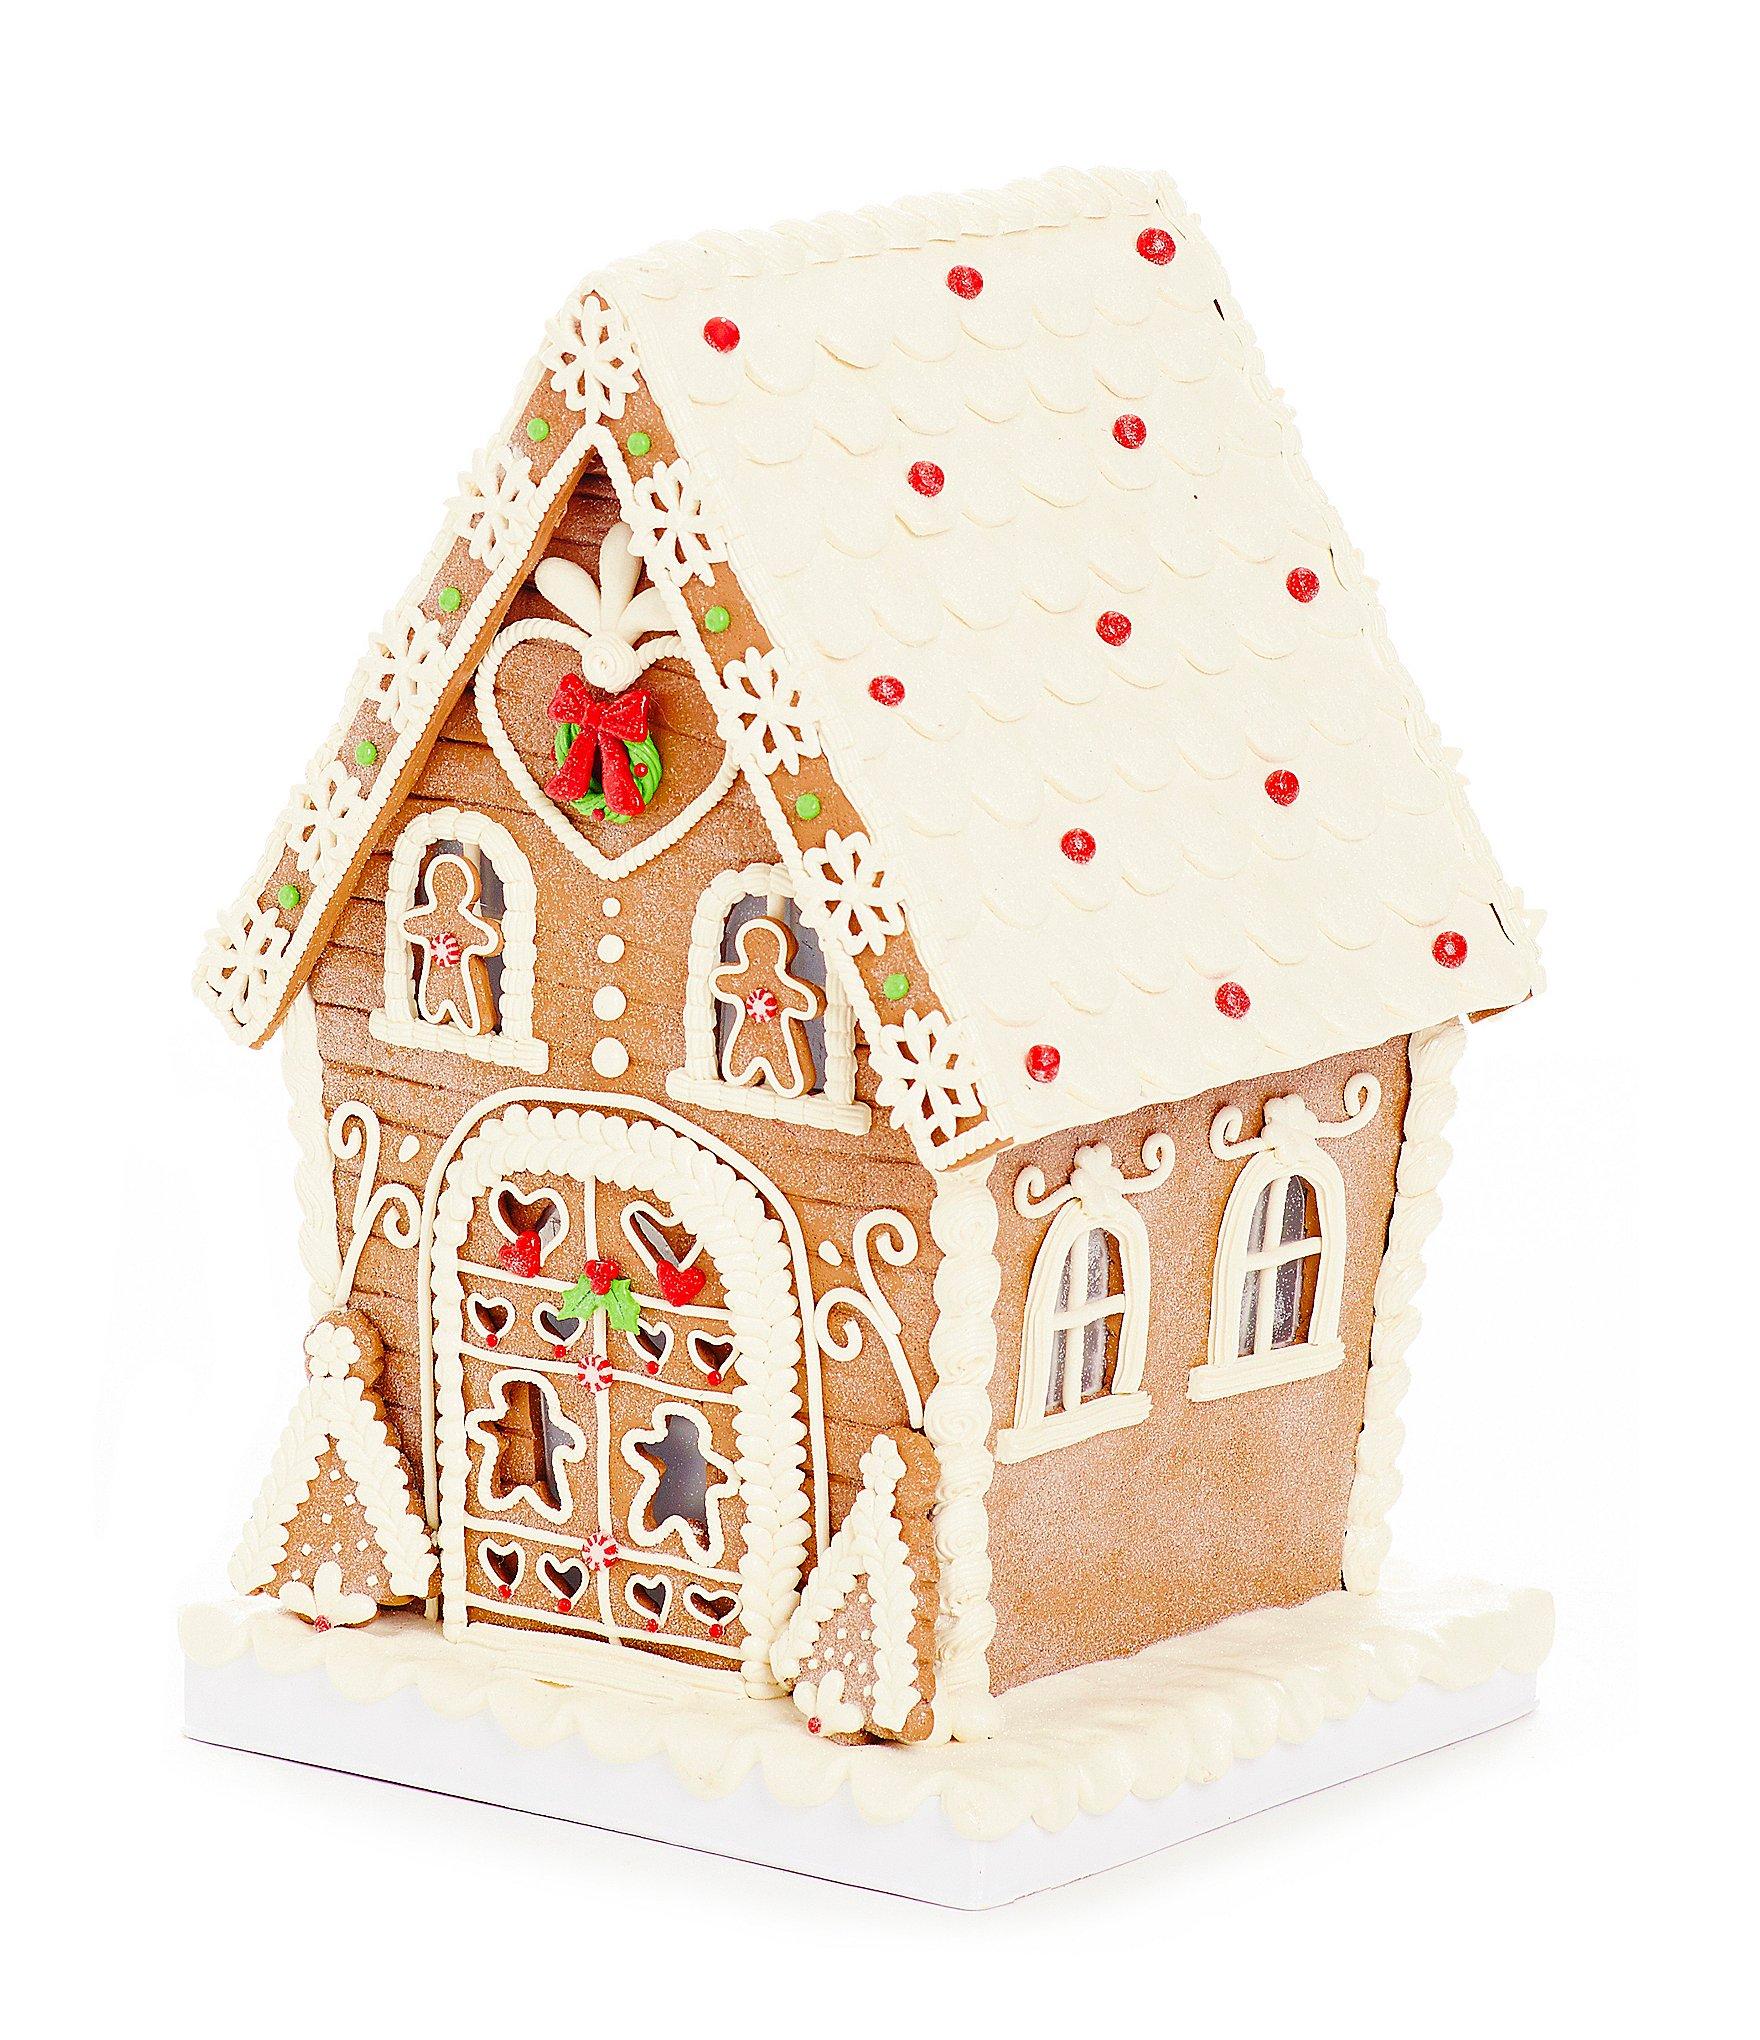 mud pie christmas home decor 2018 sale - Mud Pie Christmas Home Decor